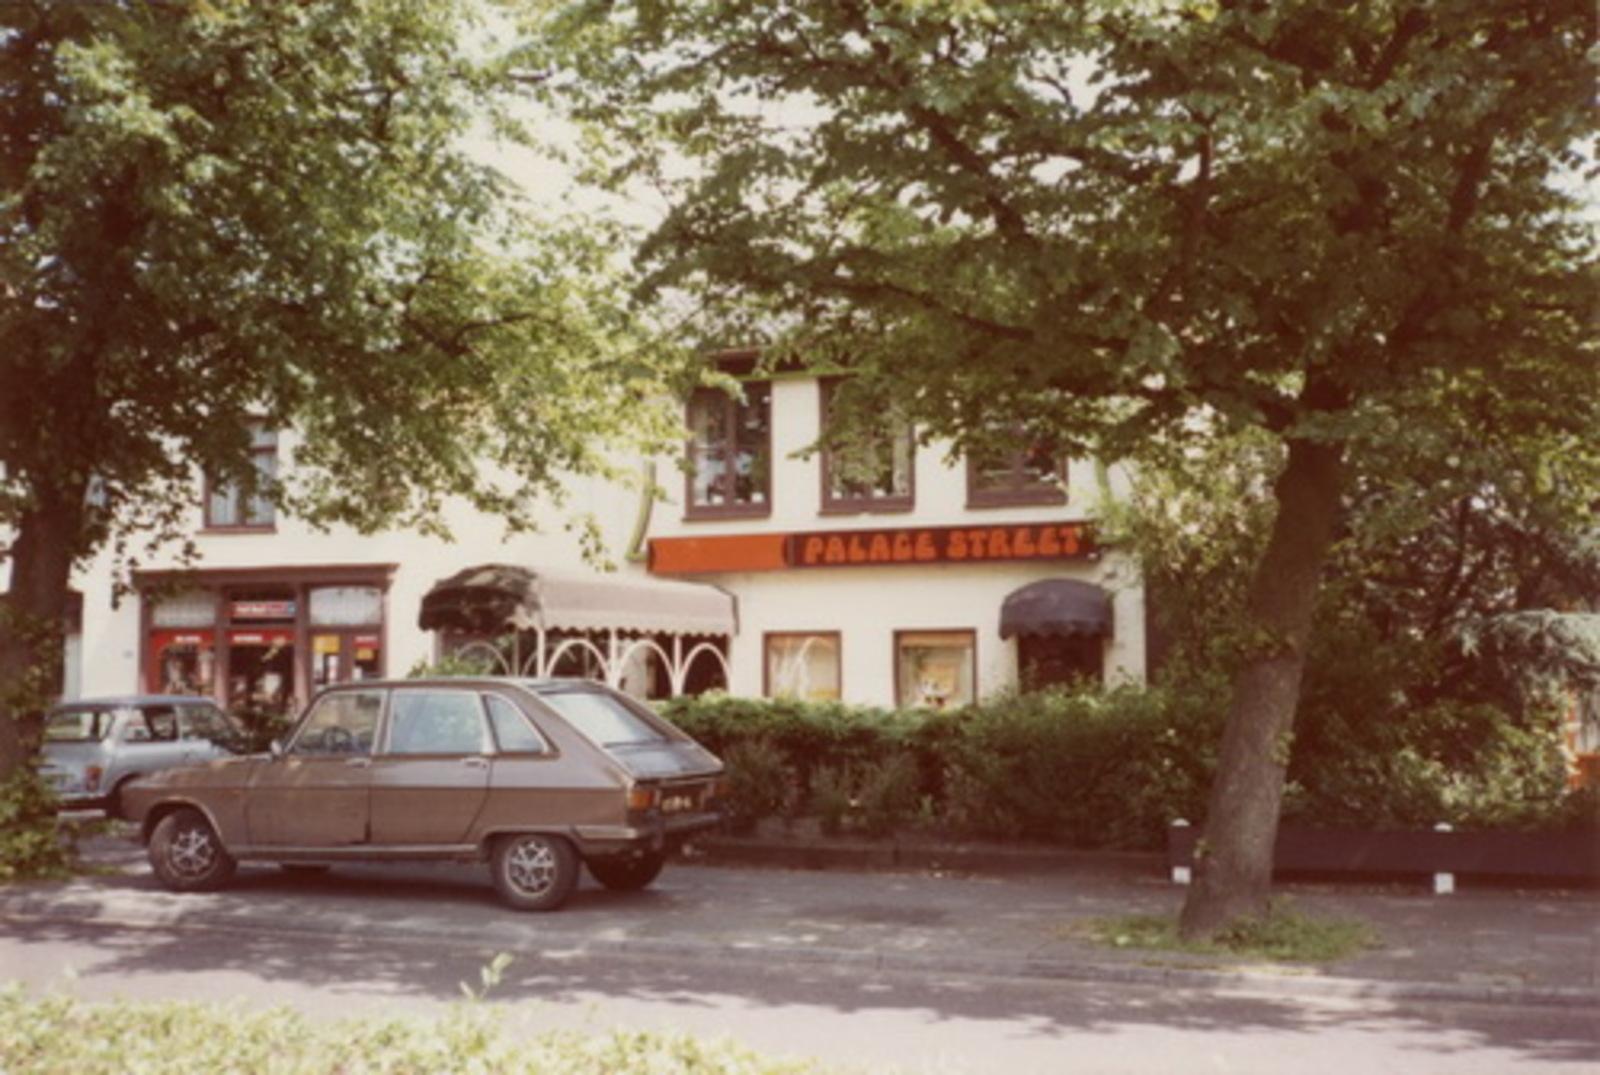 Kruisweg N 1043 1983 Dancing Palace Street